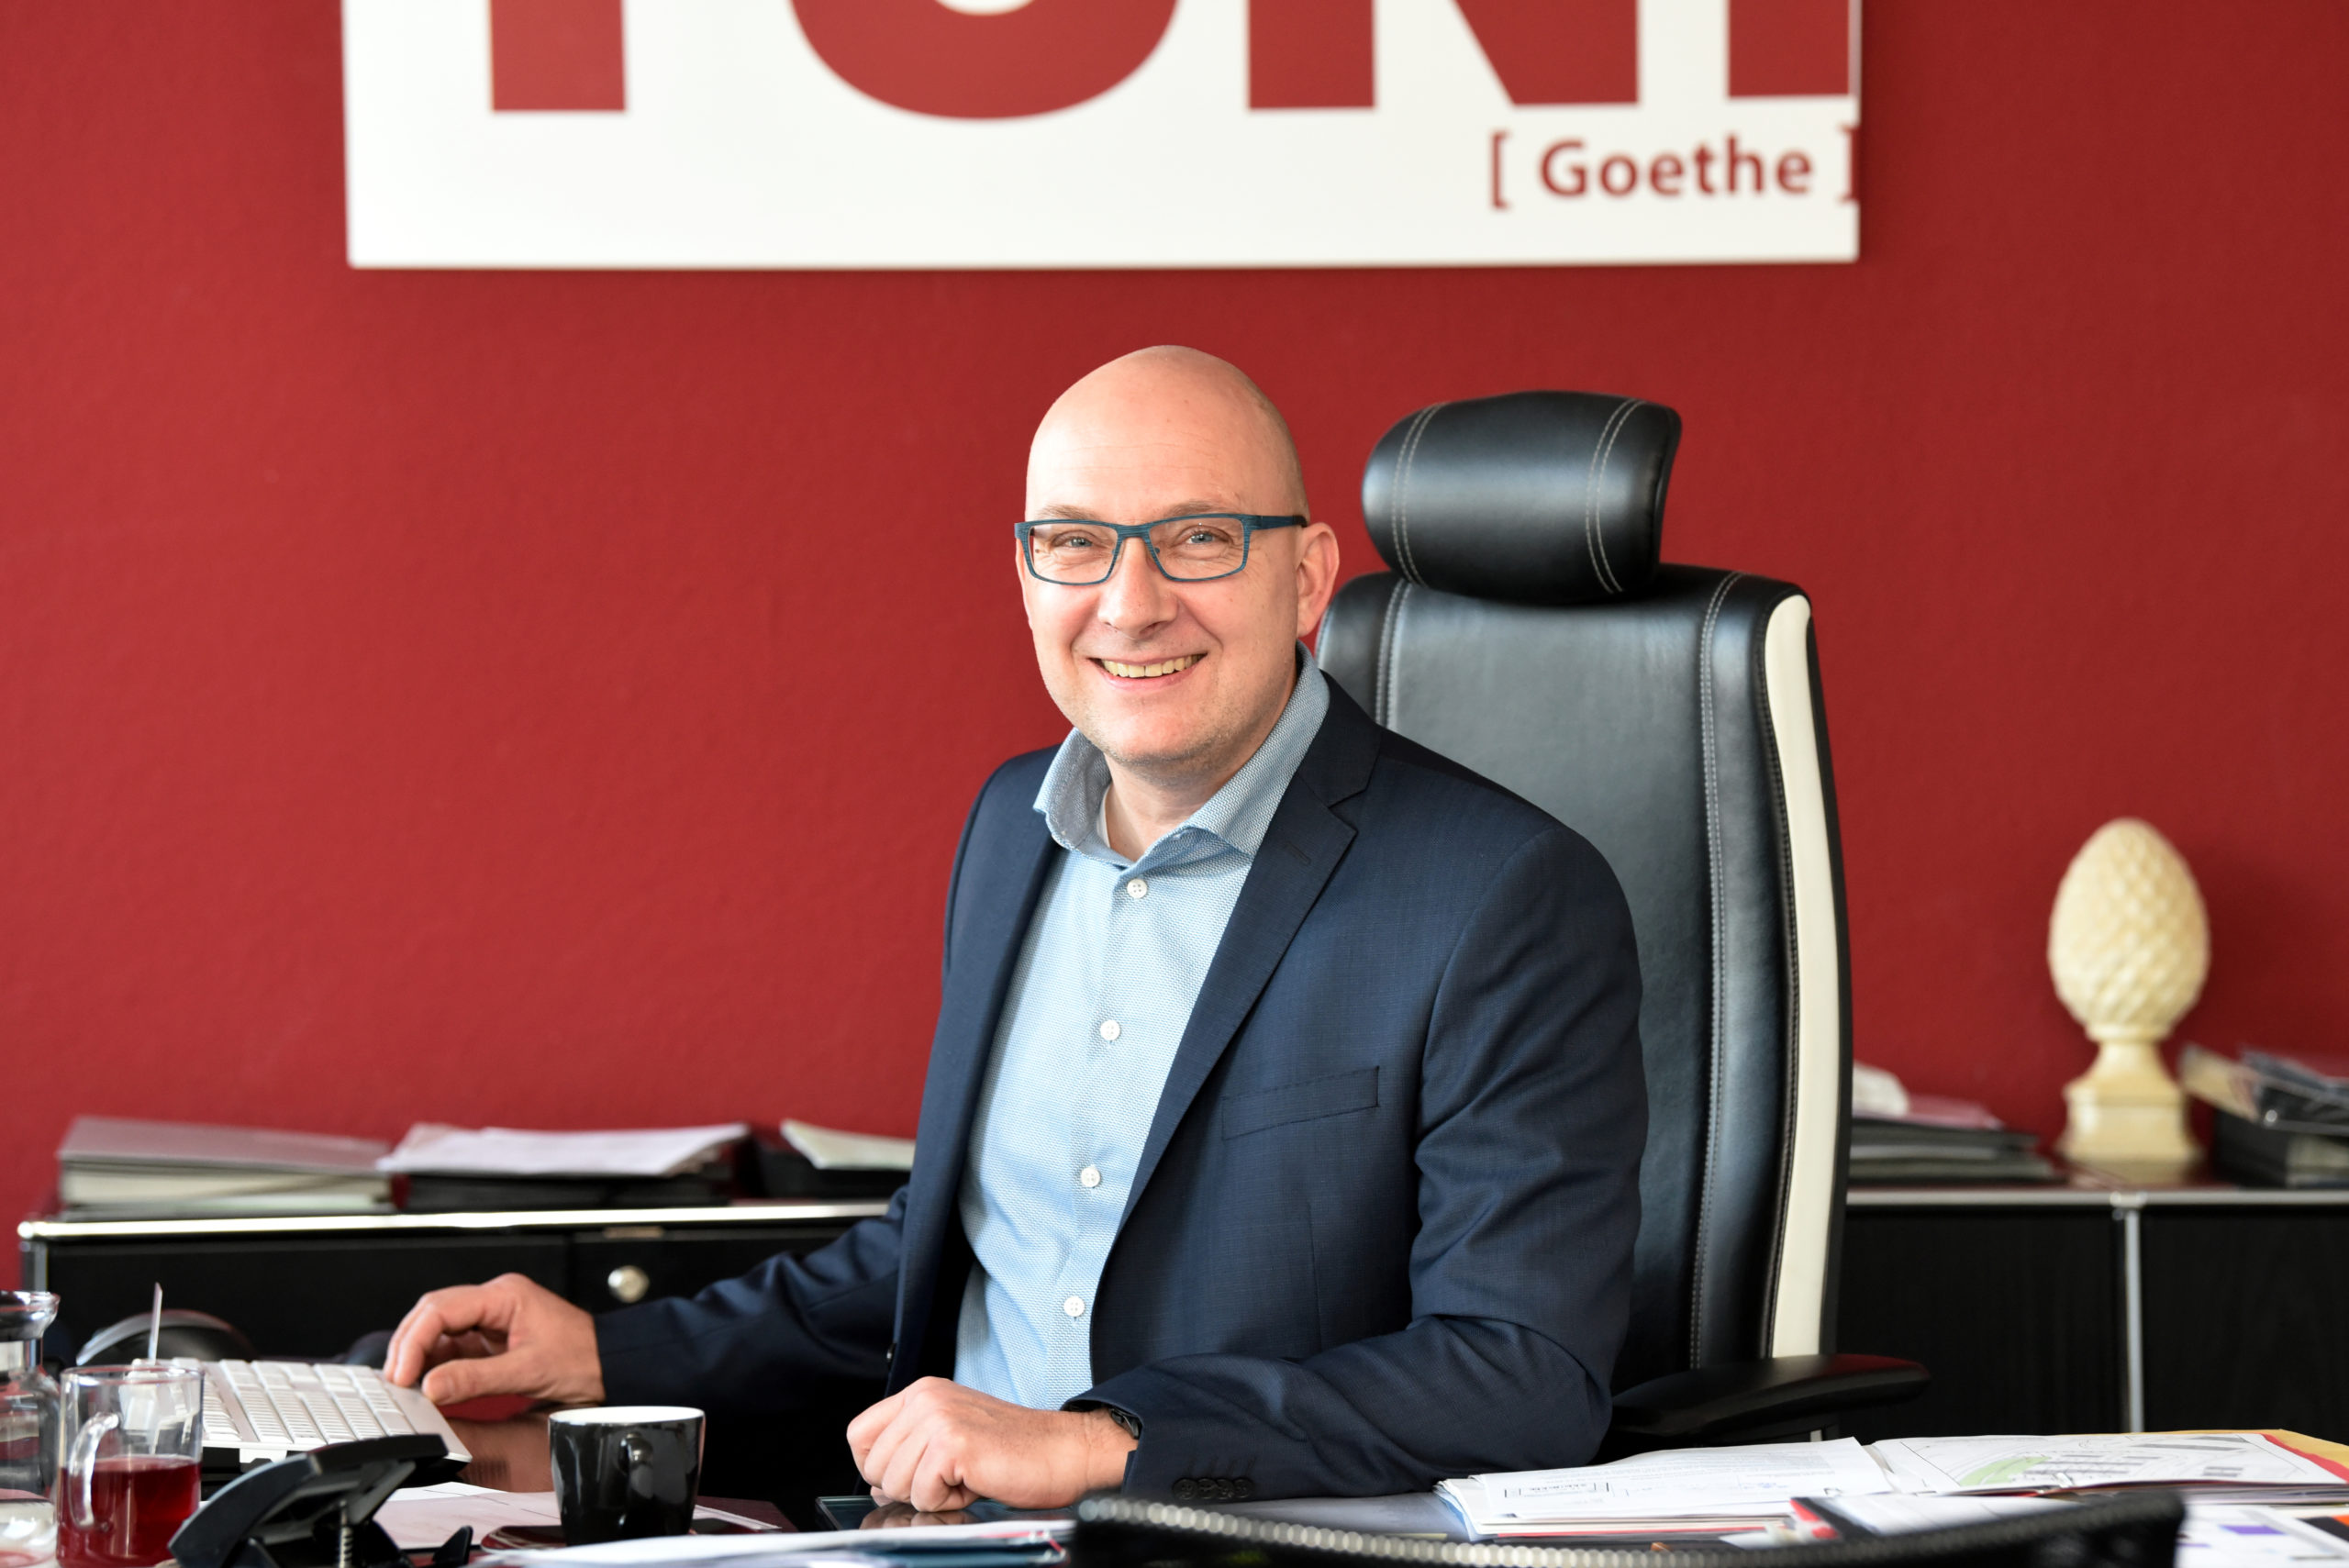 Ralf Schmidtmann ist Leiter des Liegenschaftsamtes der Stadt Augsburg